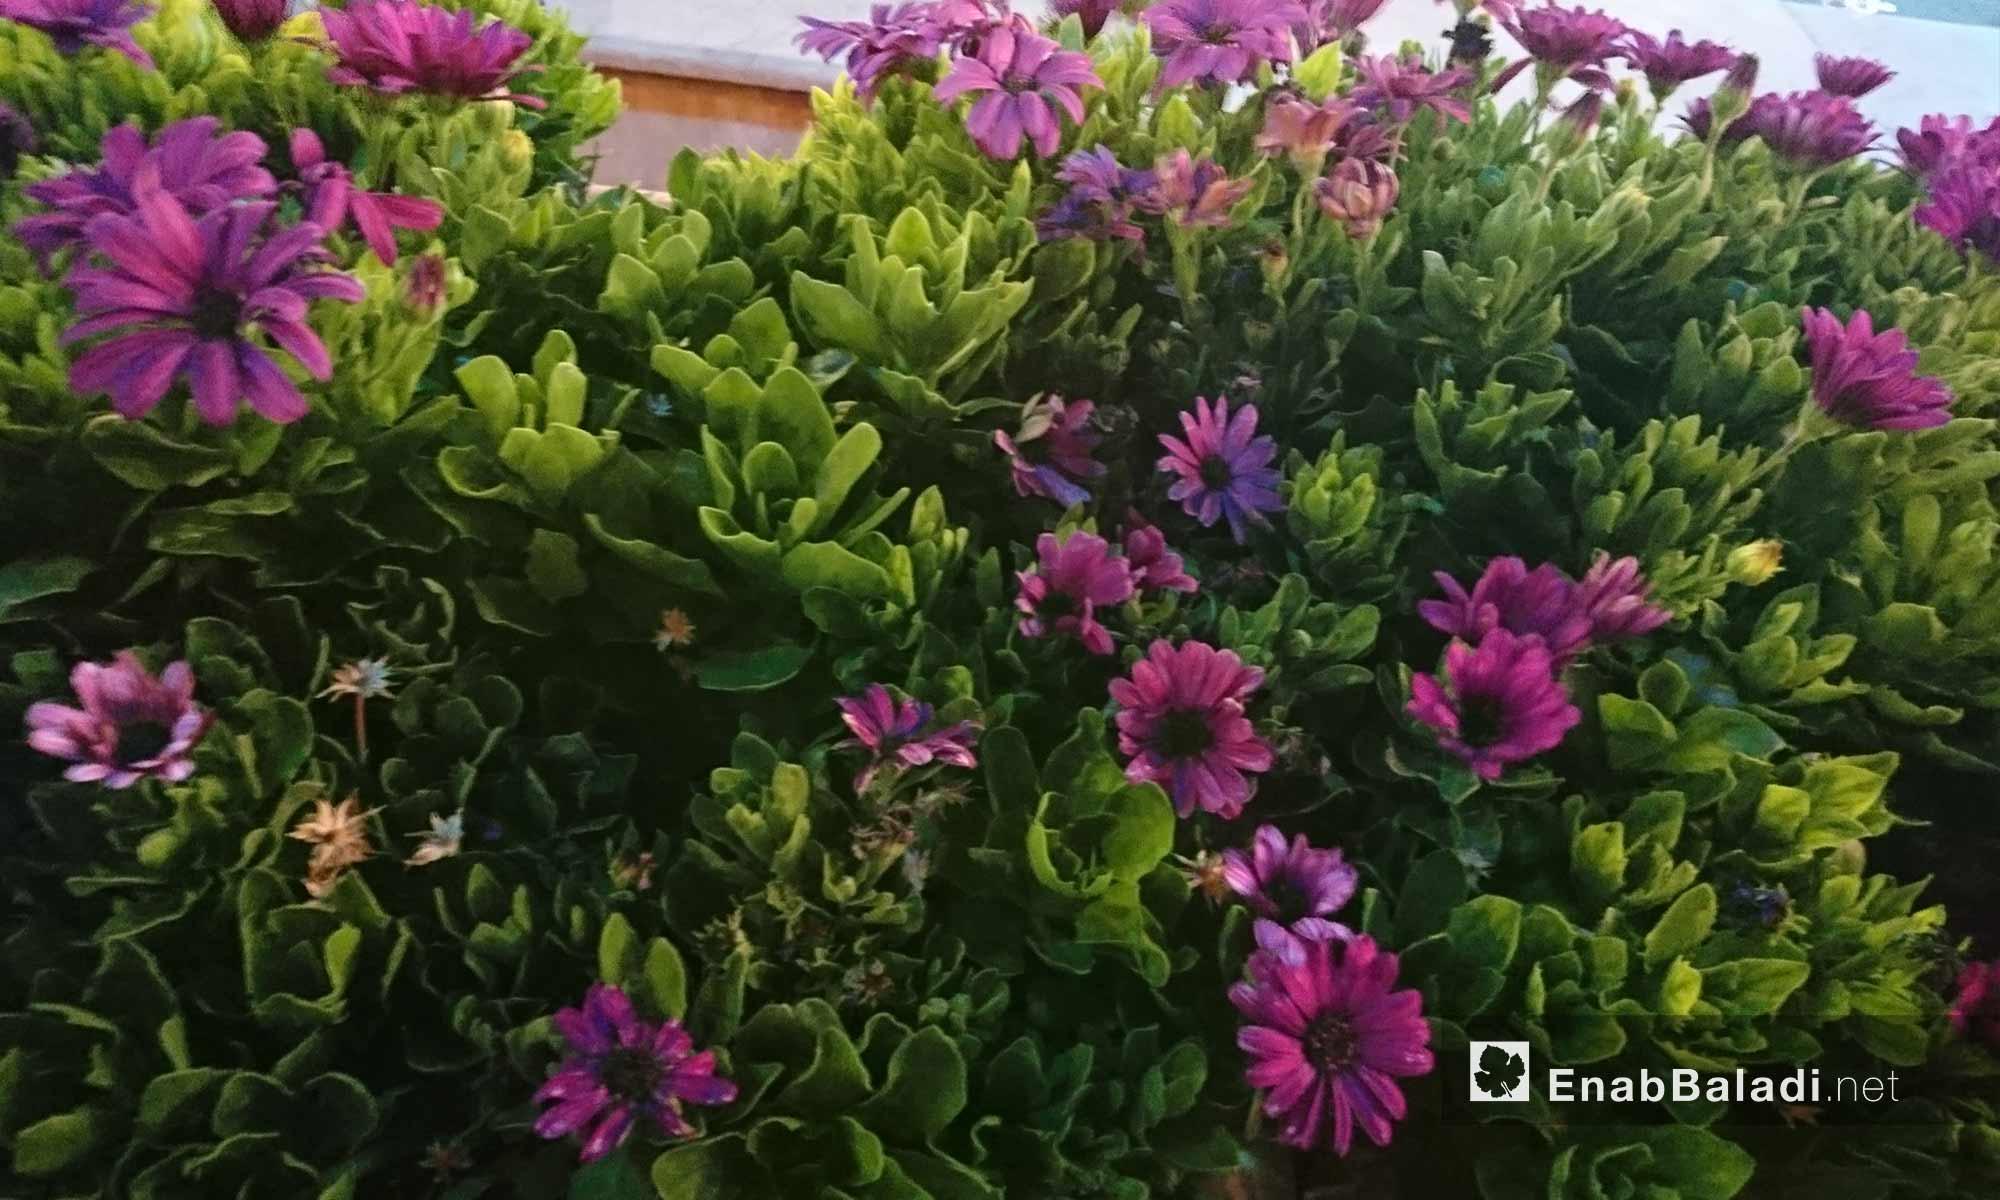 Flowers at the Uptown Center, Mashrou Dummar – June 22, 2018 (Enab Baladi)